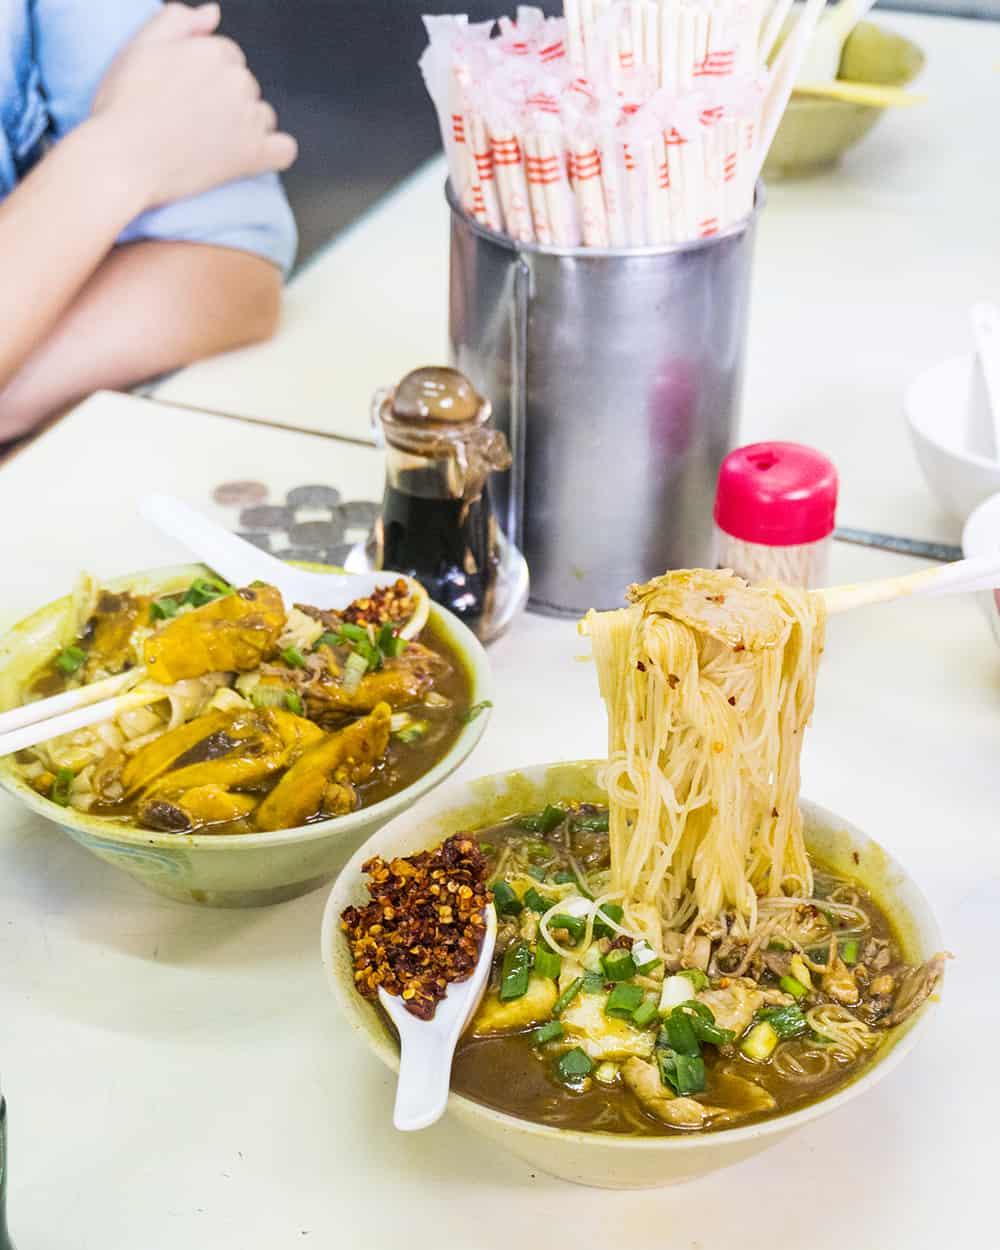 Hong Kong curry noodles